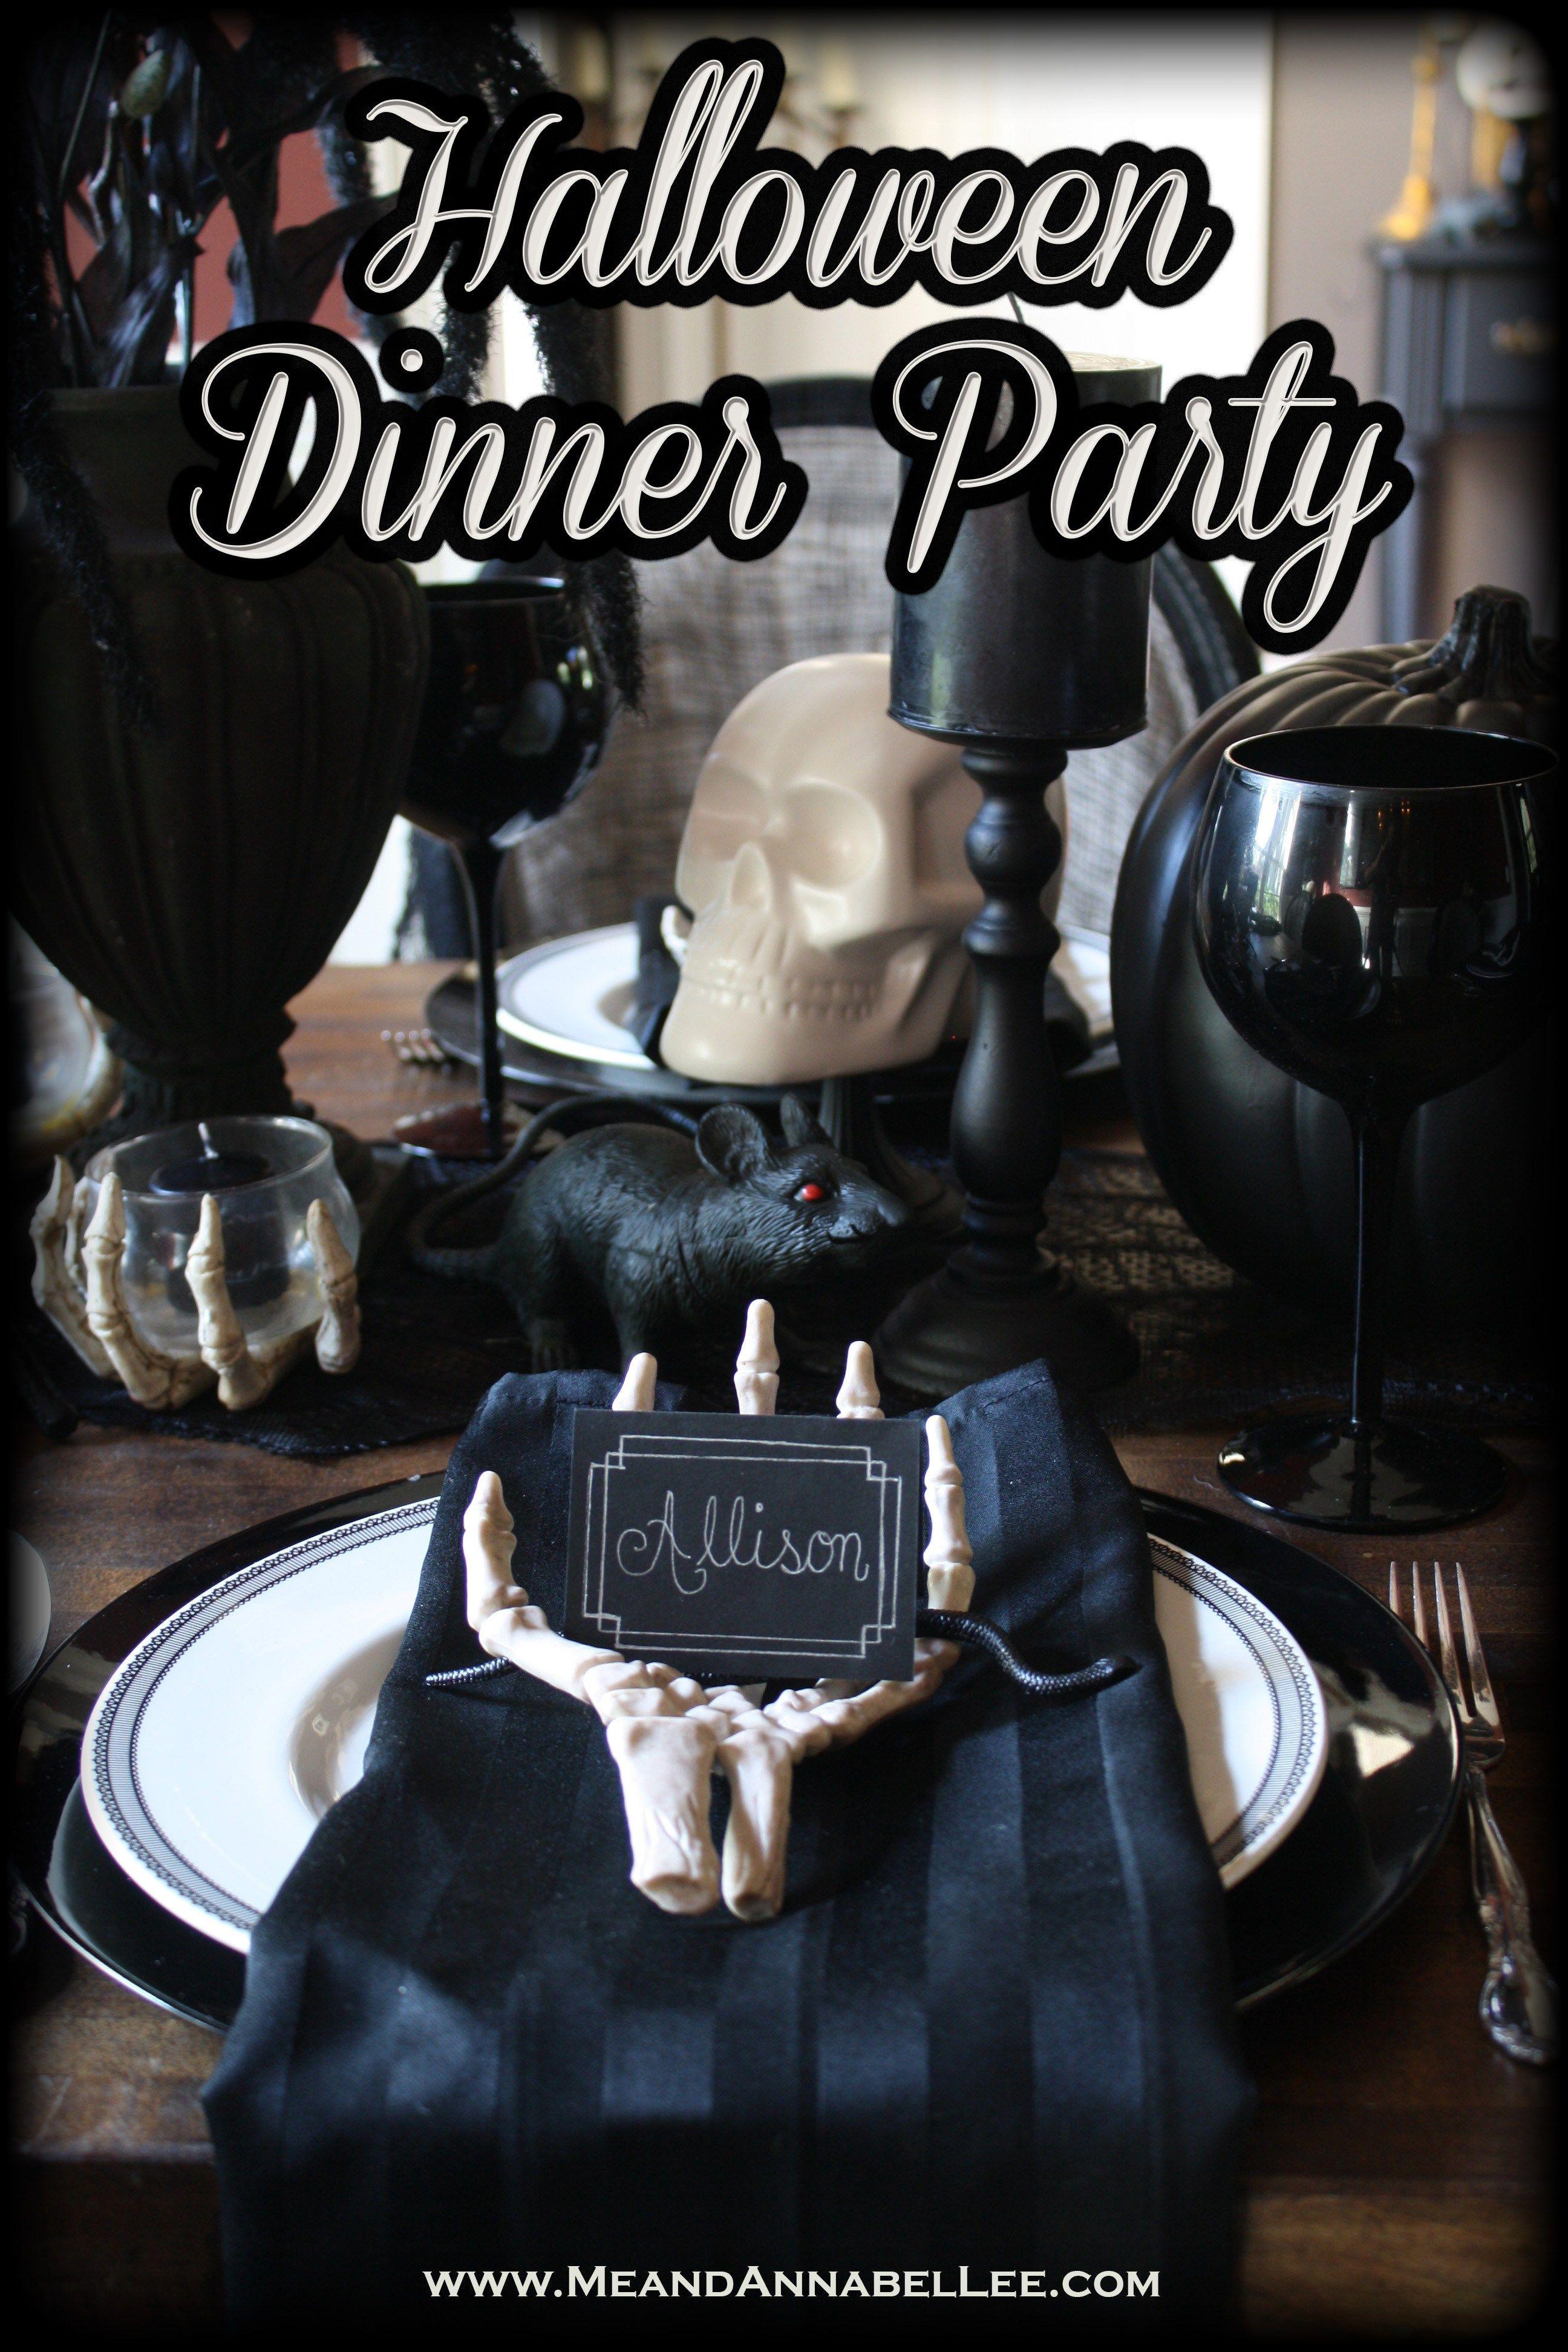 Halloween Dinner Party | Halloween dinner parties